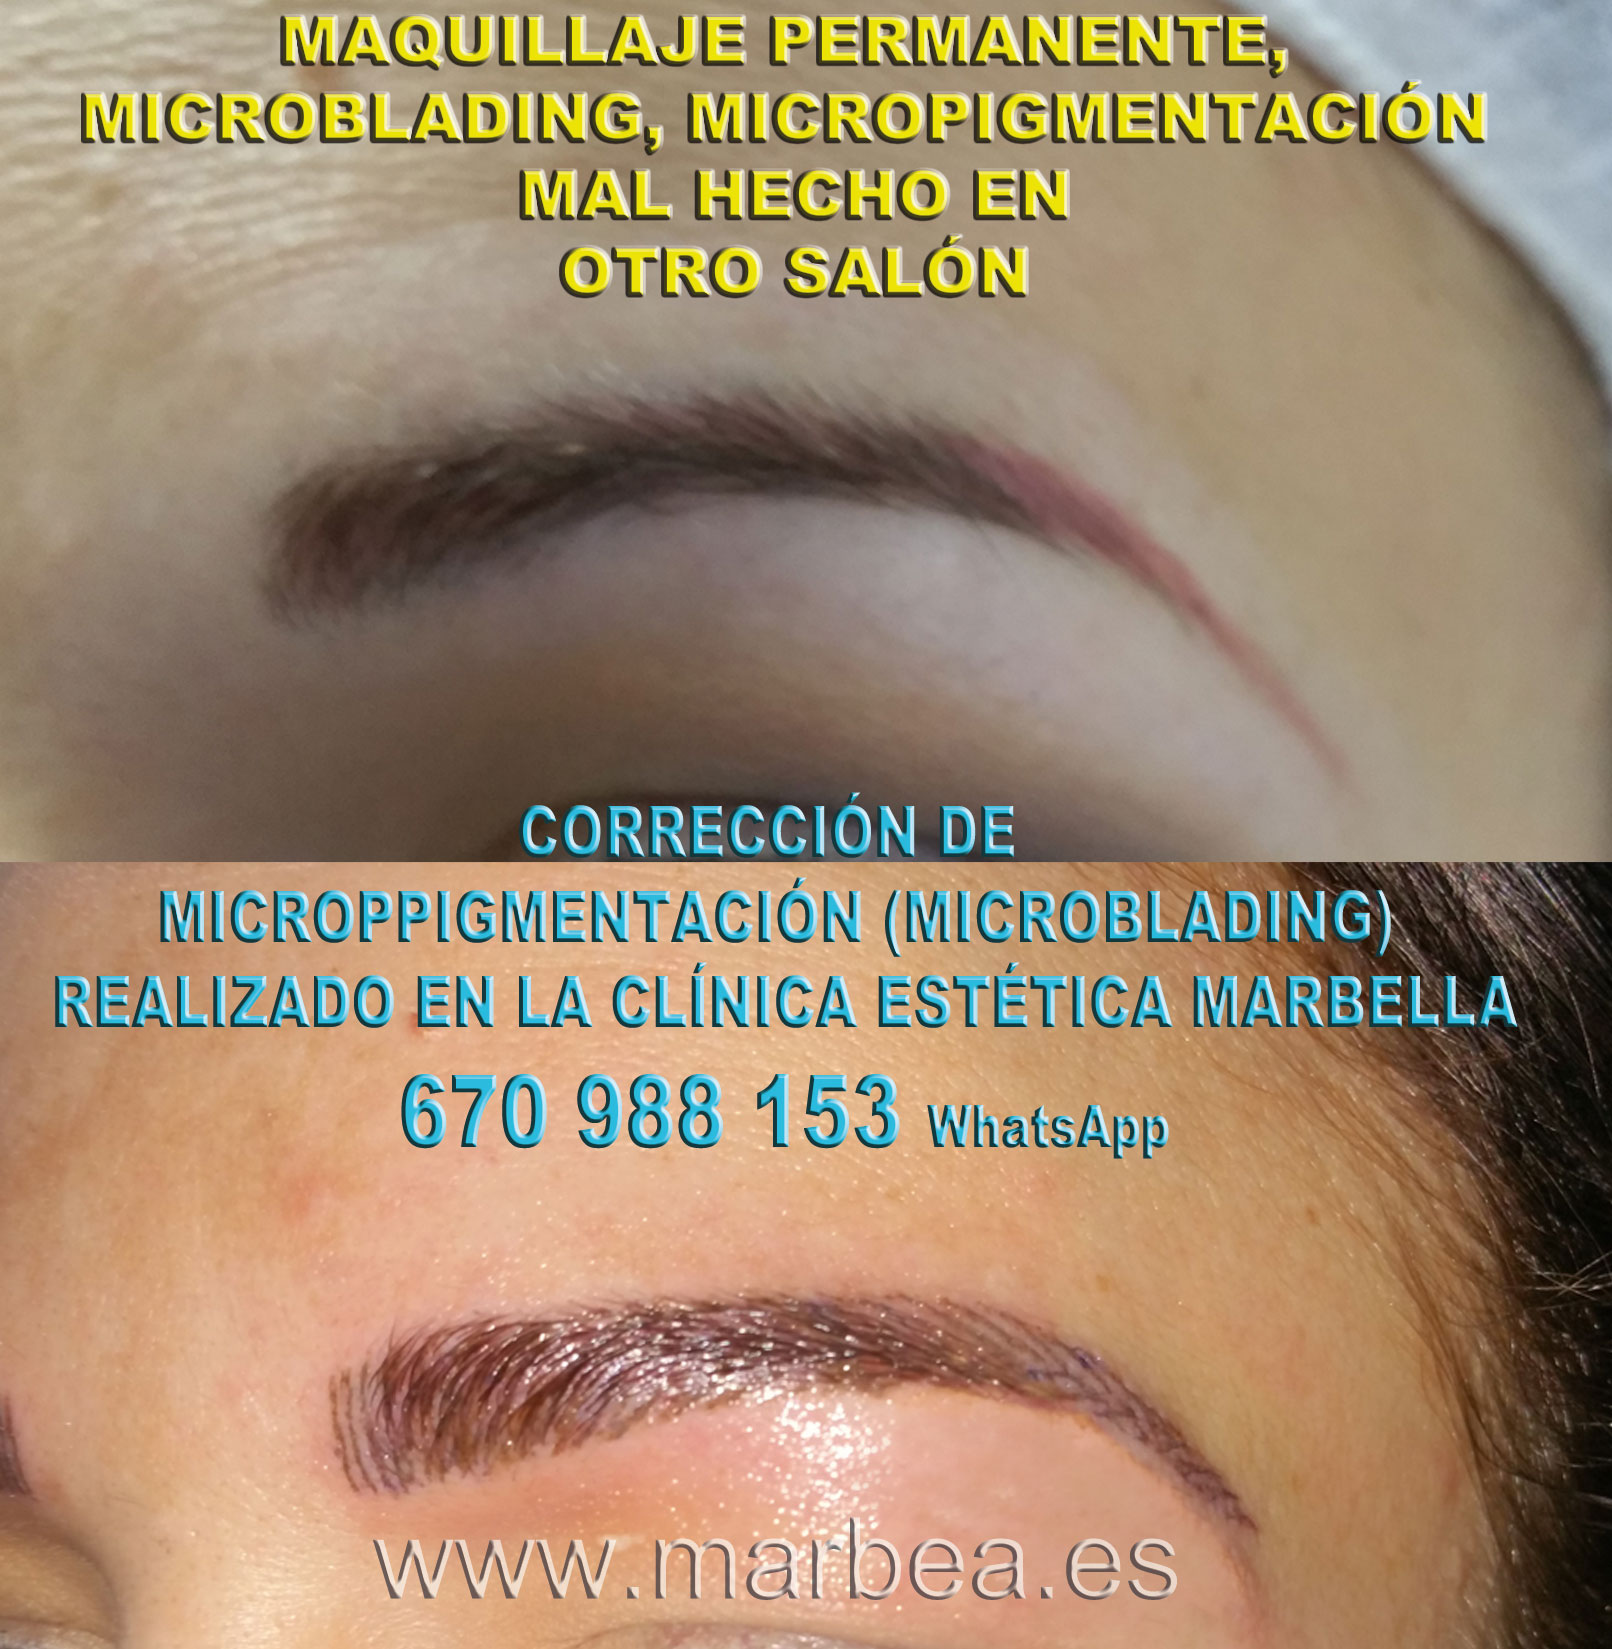 MAQUILLAJE PERMANENTE CEJAS MAL HECHO clínica estética tatuaje propone micropigmentacion correctiva de cejas,corregir micropigmentación mal hecha